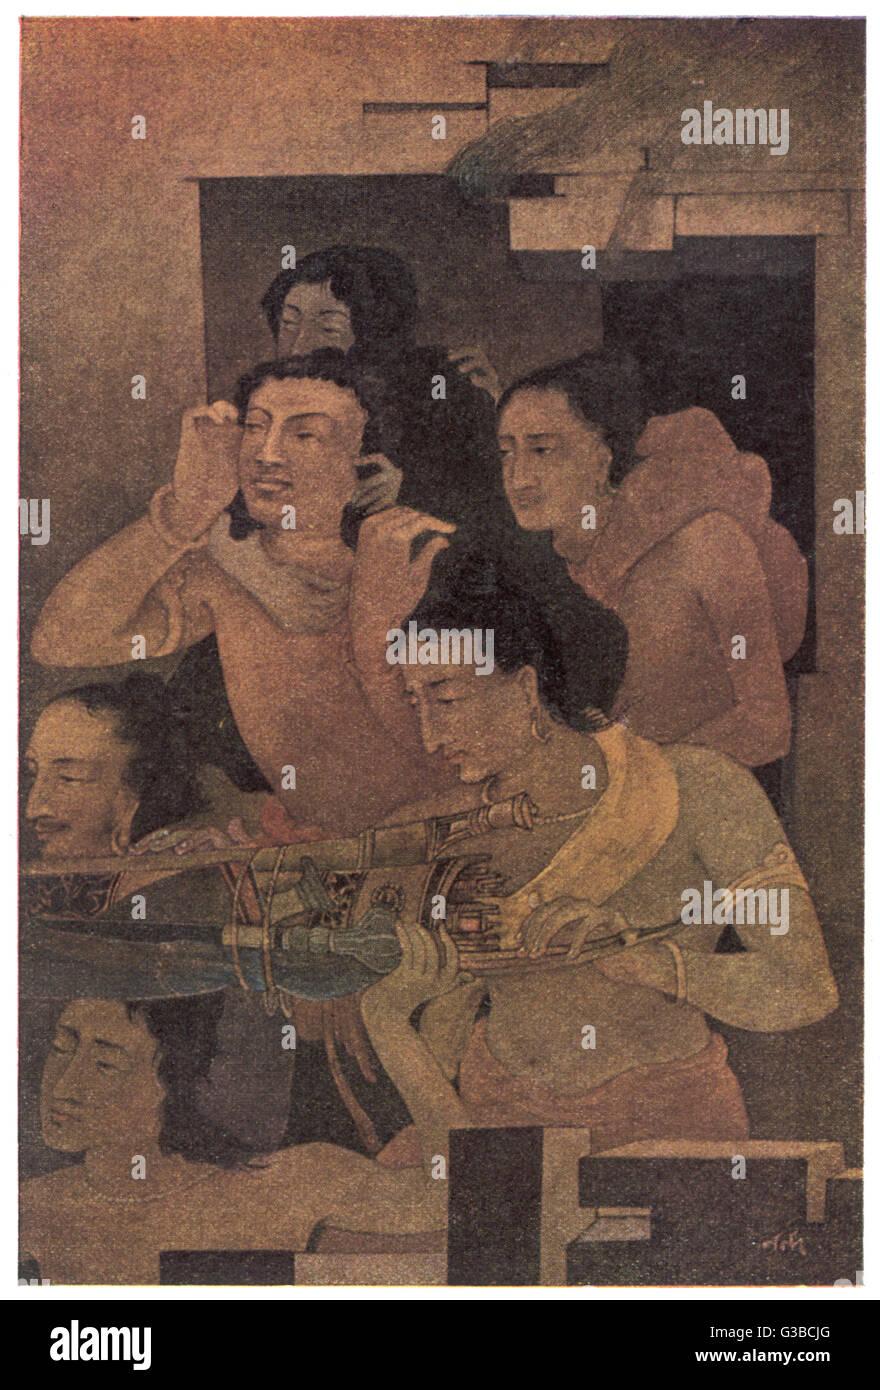 Indiana Mahabharata: i capi in casa fatta di Lac. Immagini Stock